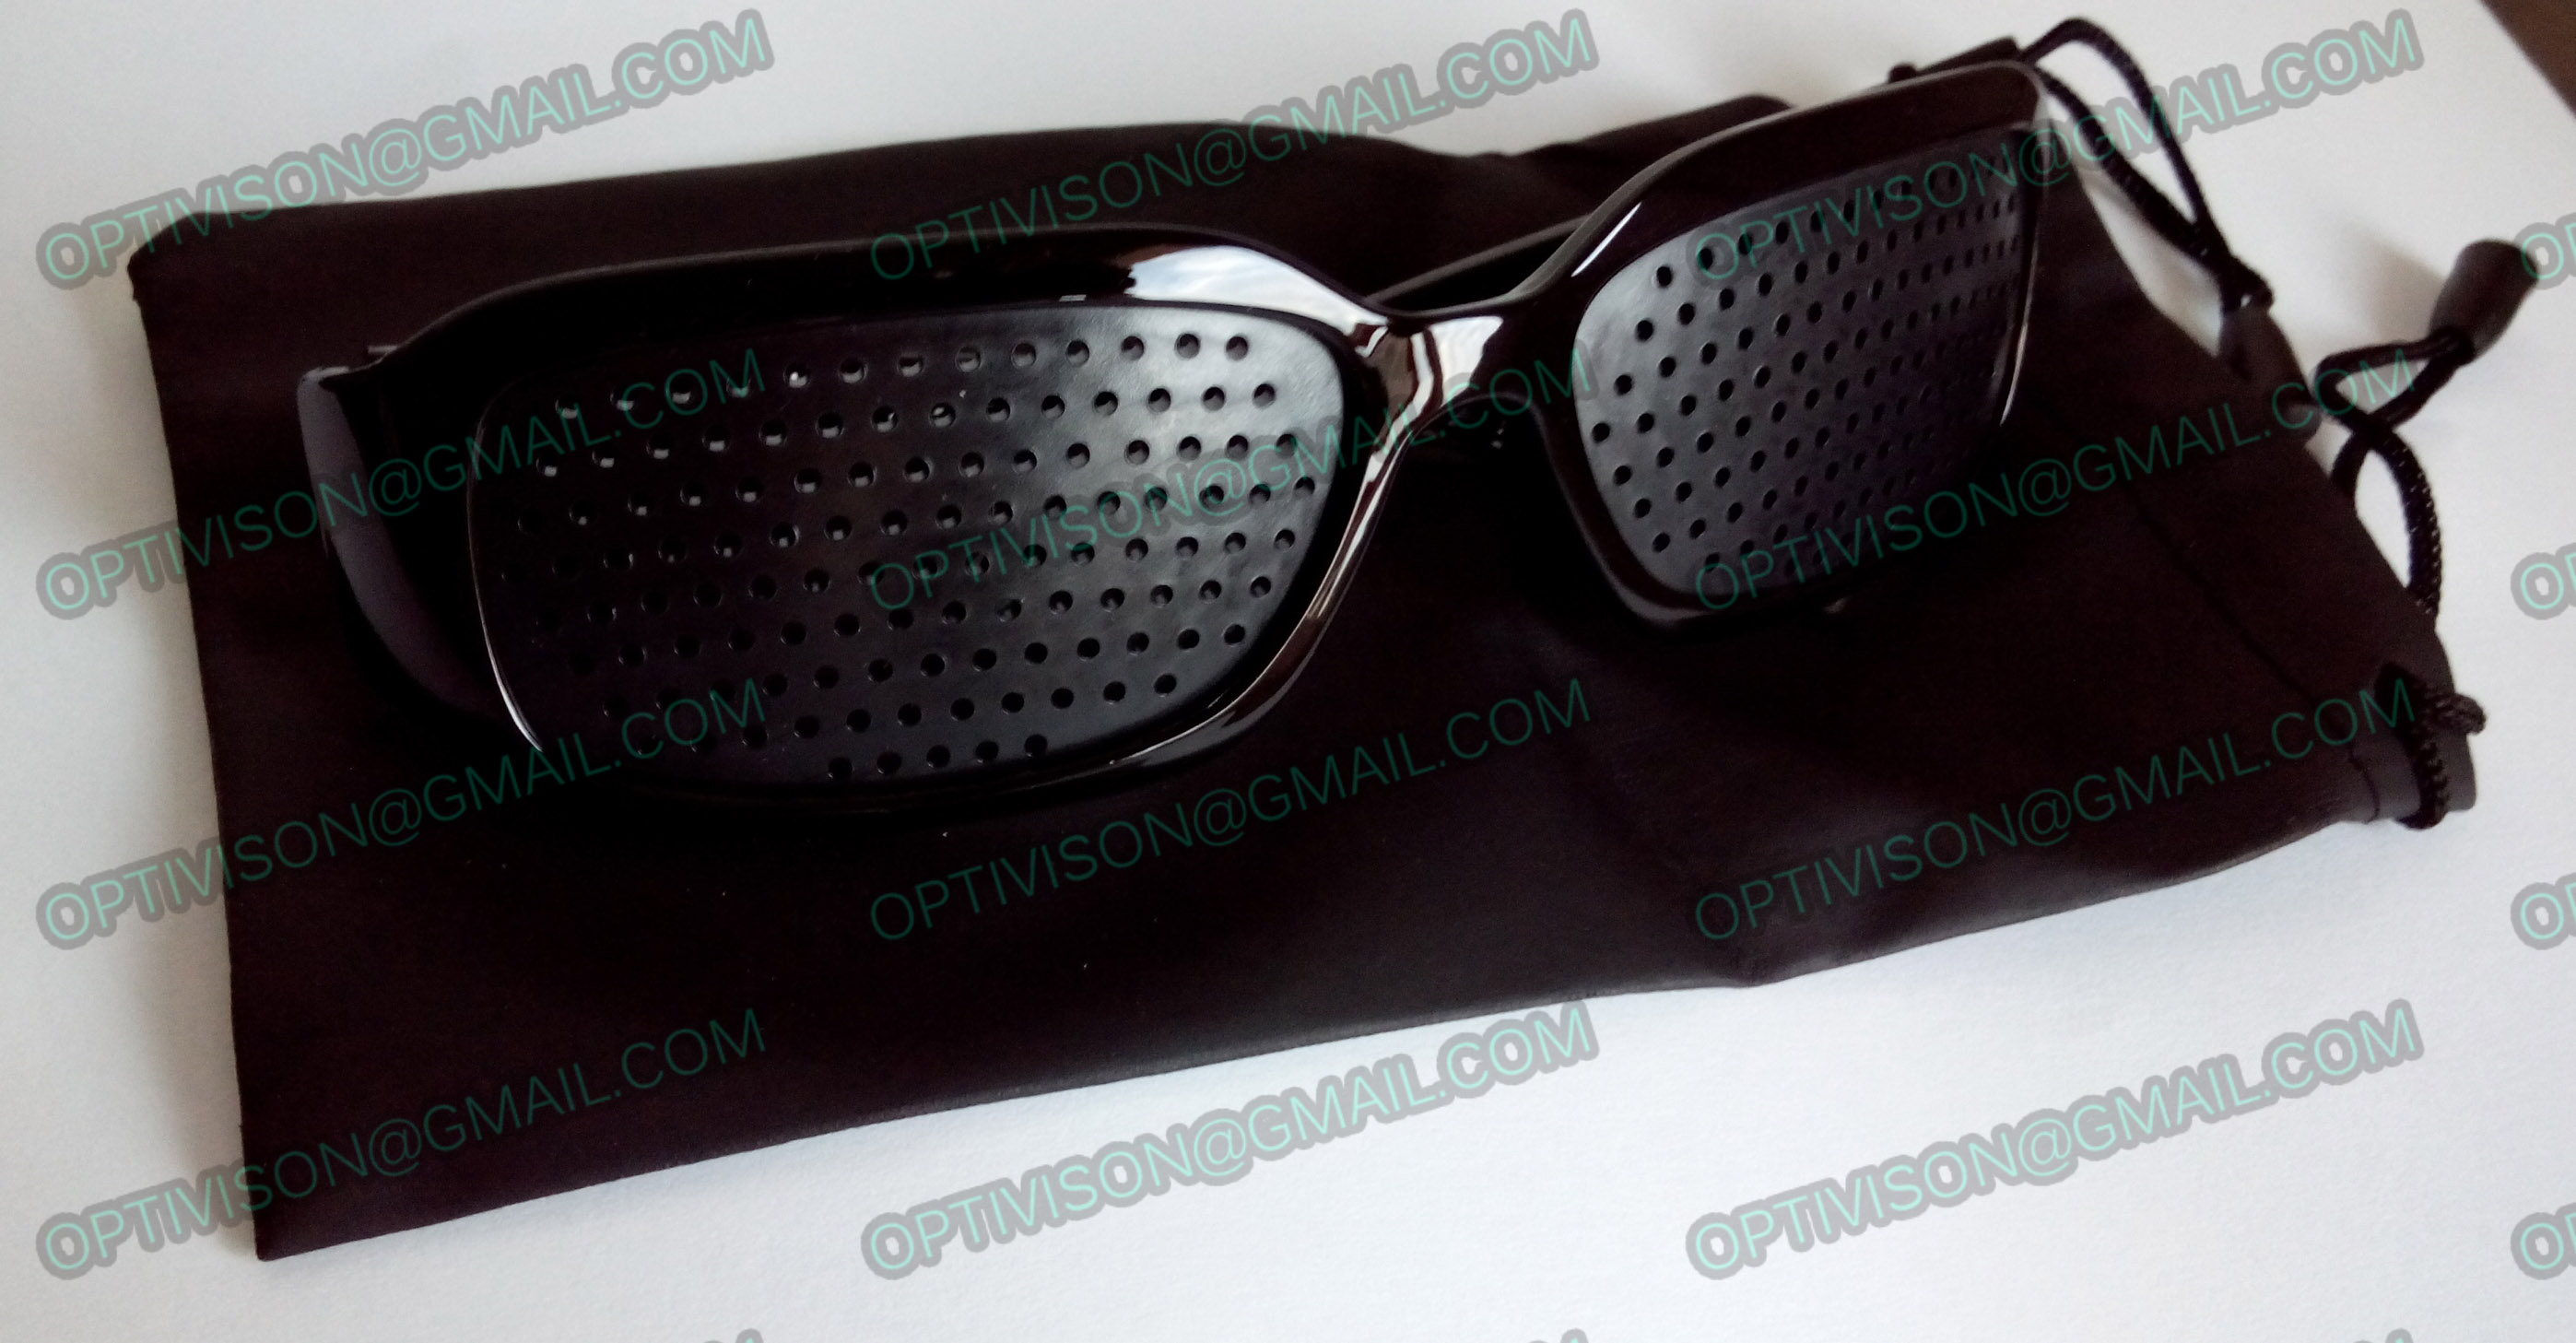 Szemtréner szemüveg. 2014.04.27. 13 45 7da72bff1c